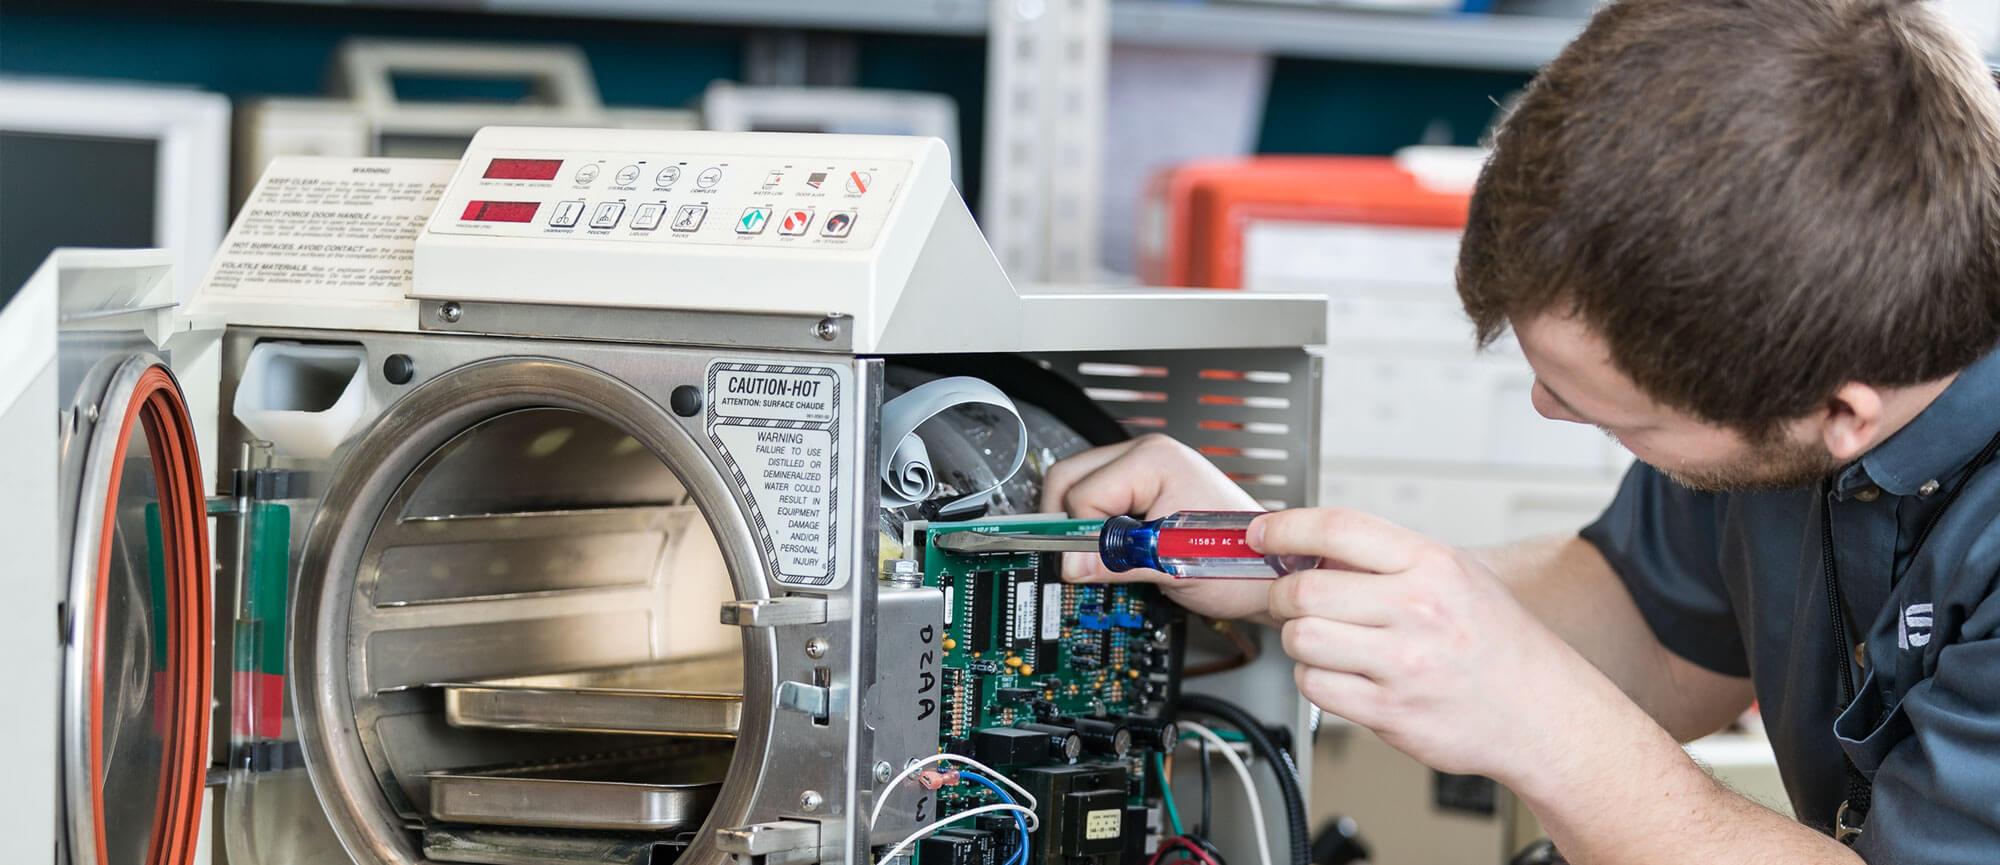 Certified Hospital Medical Equipment Manufacturer Company